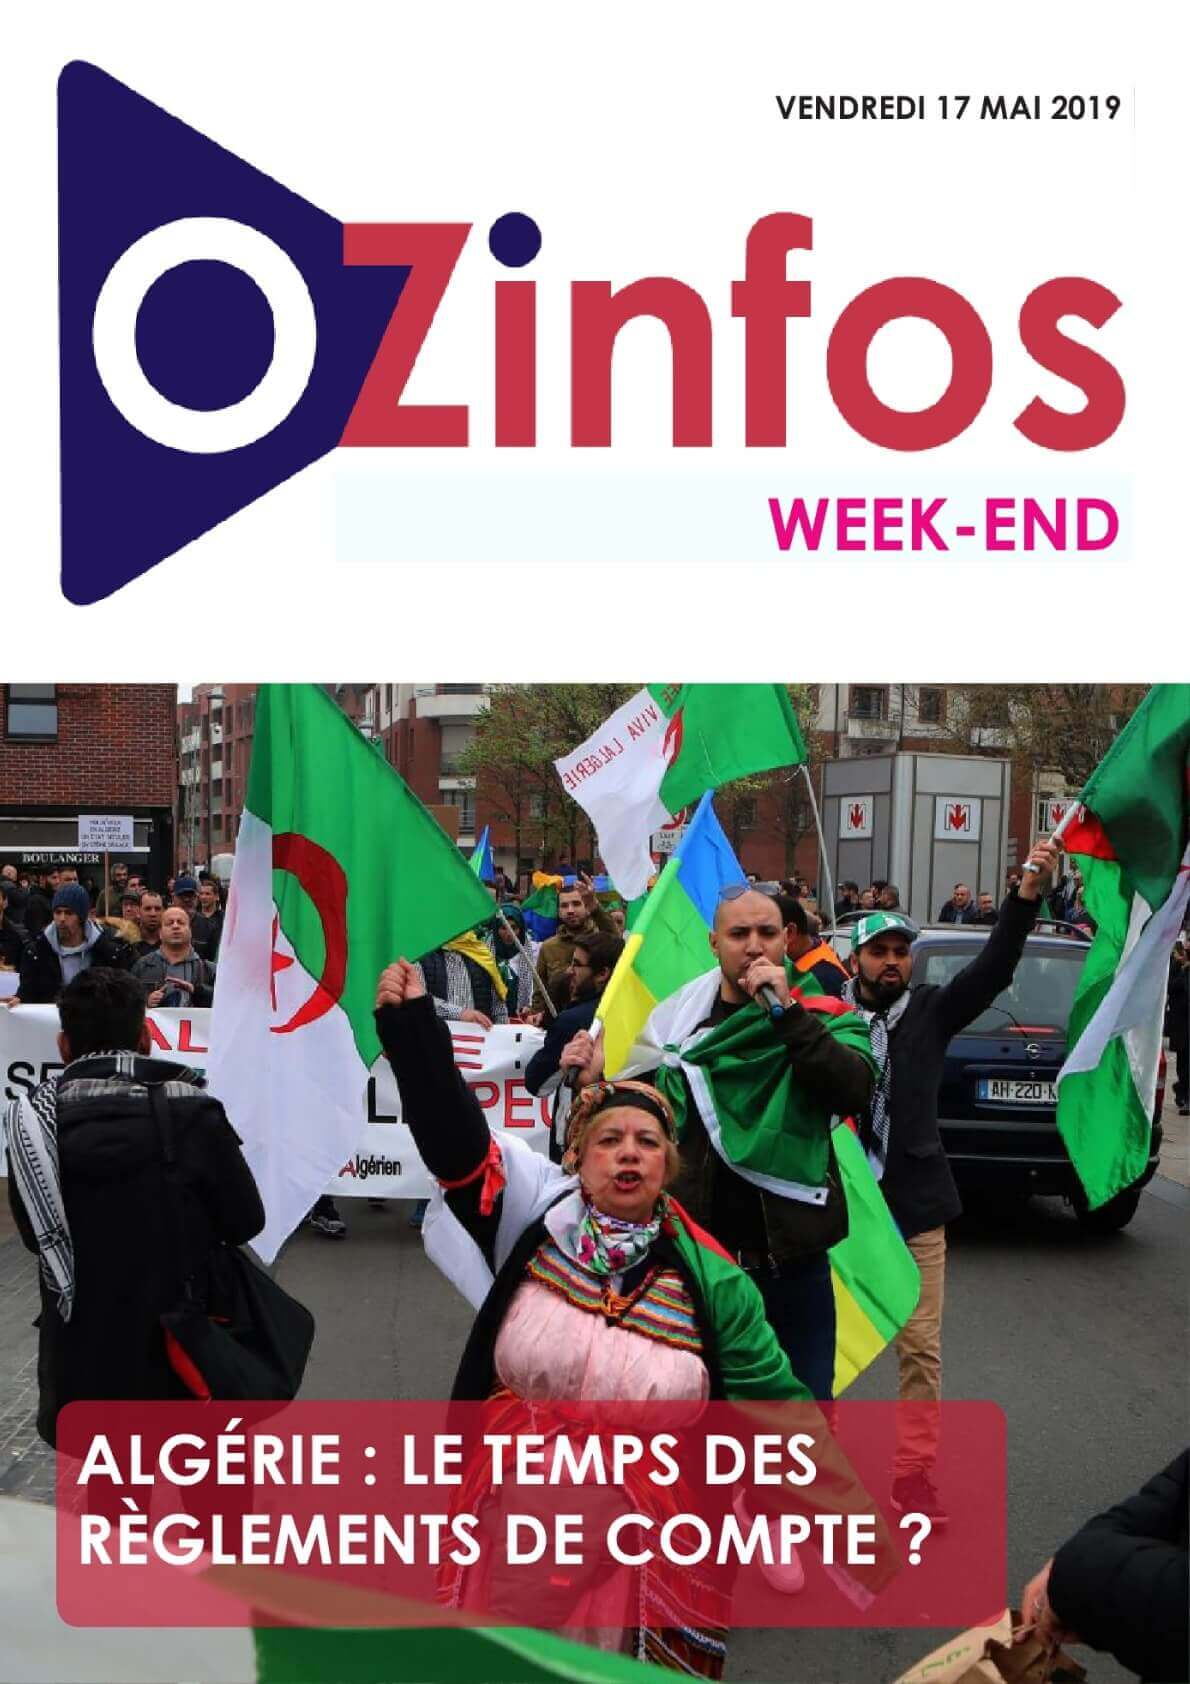 OZINFOS QUOTIDEN - 17/05/2019